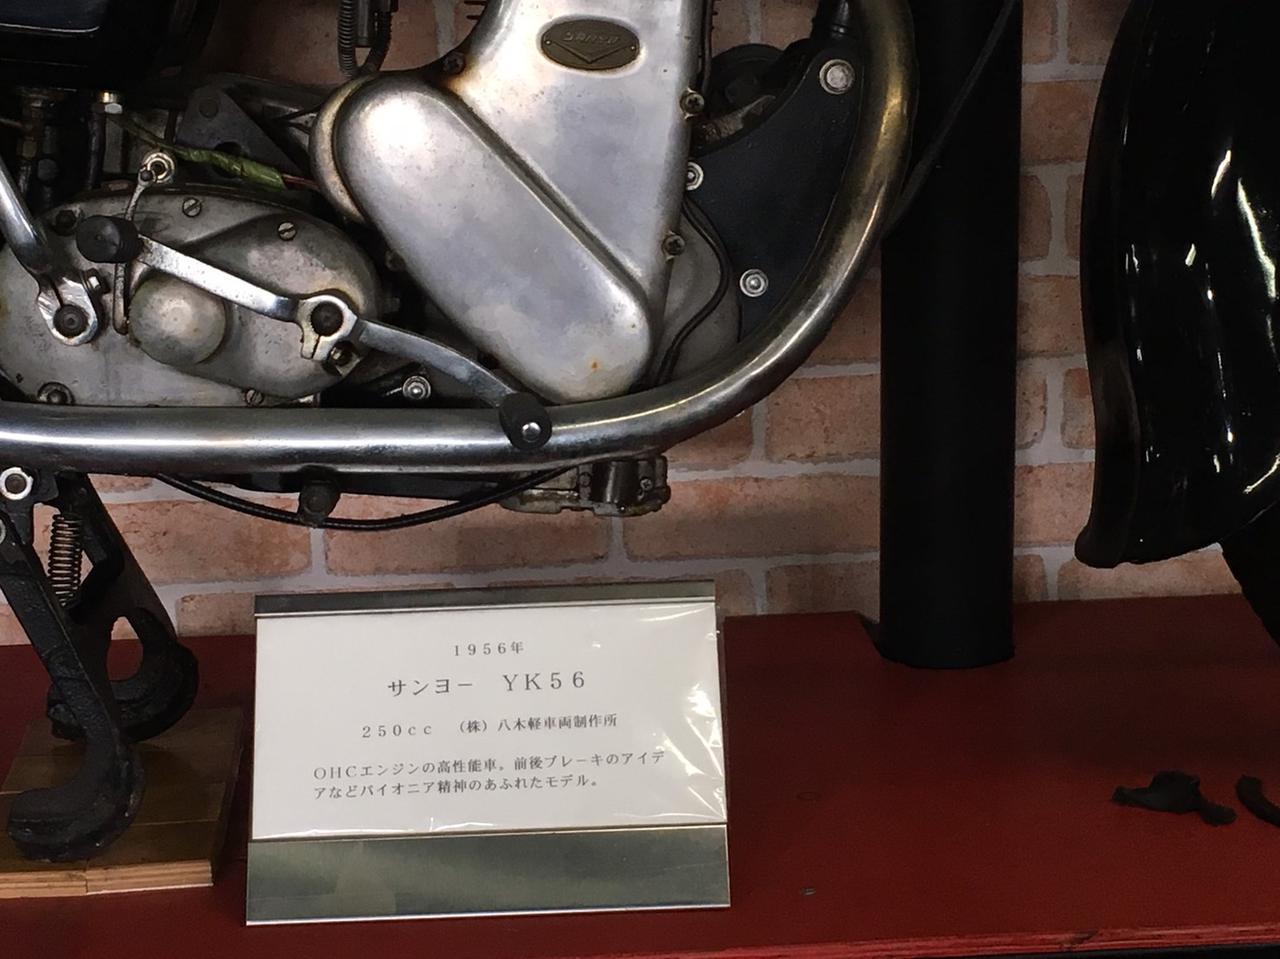 Images : 25番目の画像 - 福山理子が撮影した岩下コレクションの写真 - webオートバイ